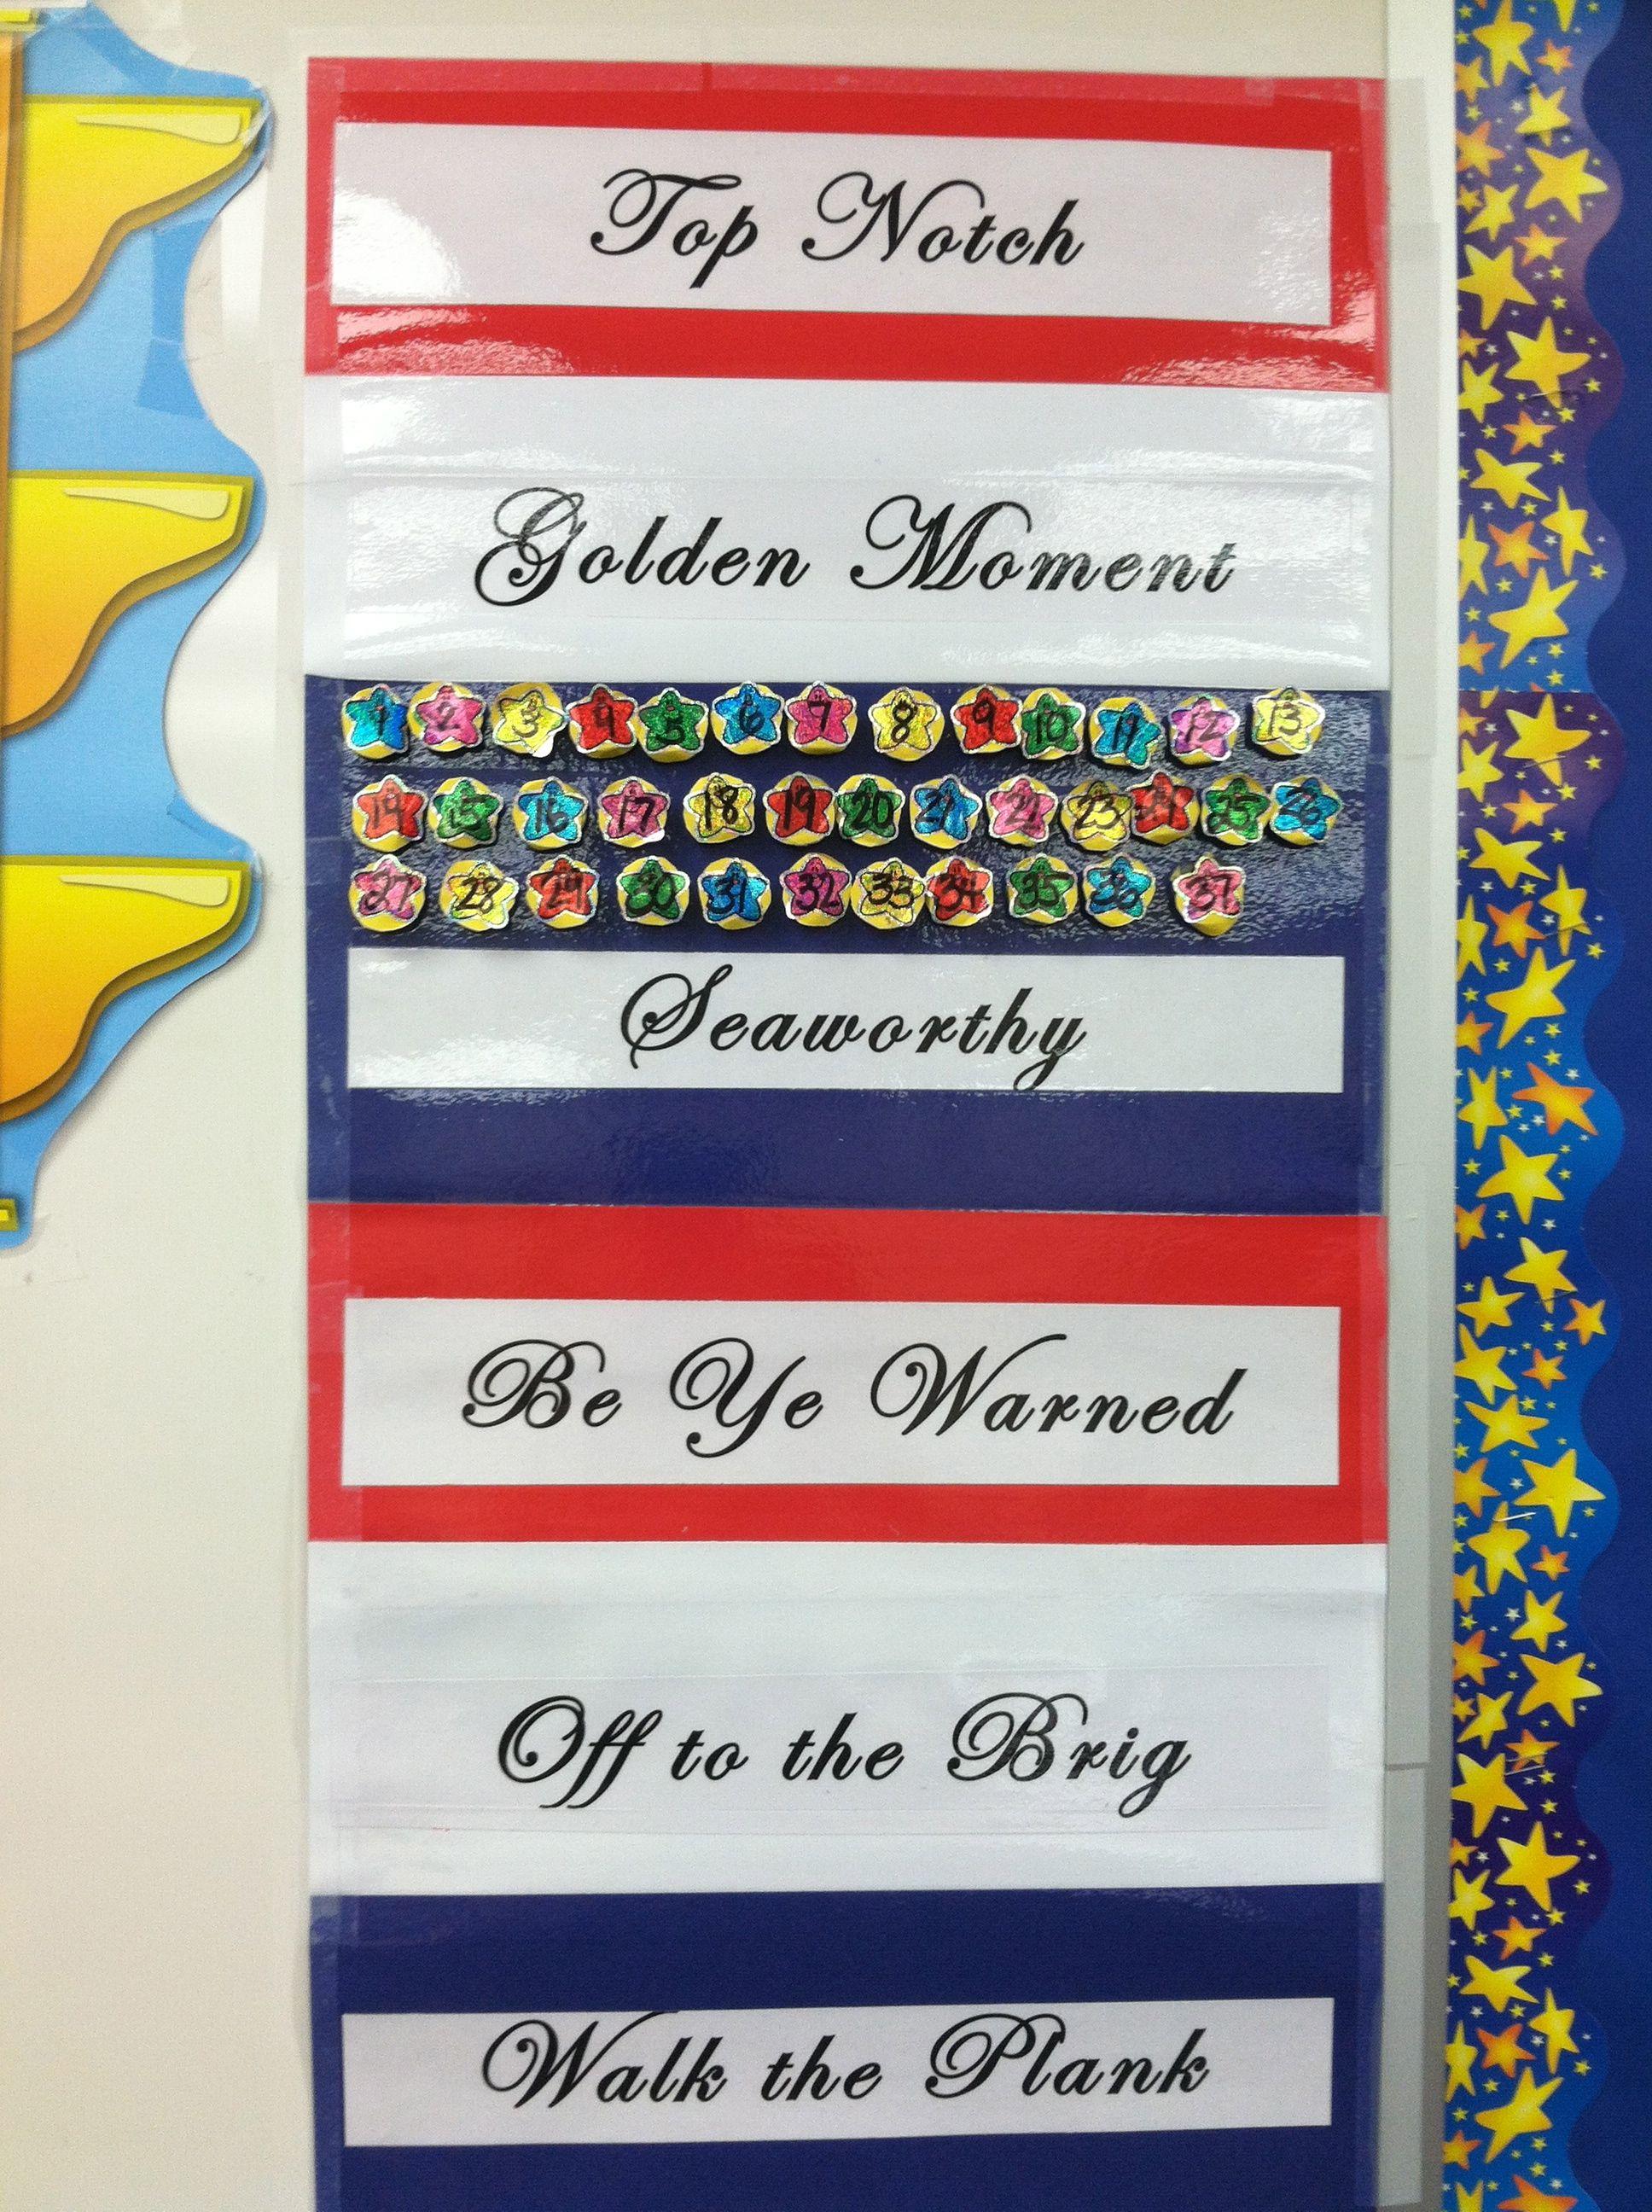 Tweeked Rick Morris' behavior chart for my fifth grade class.